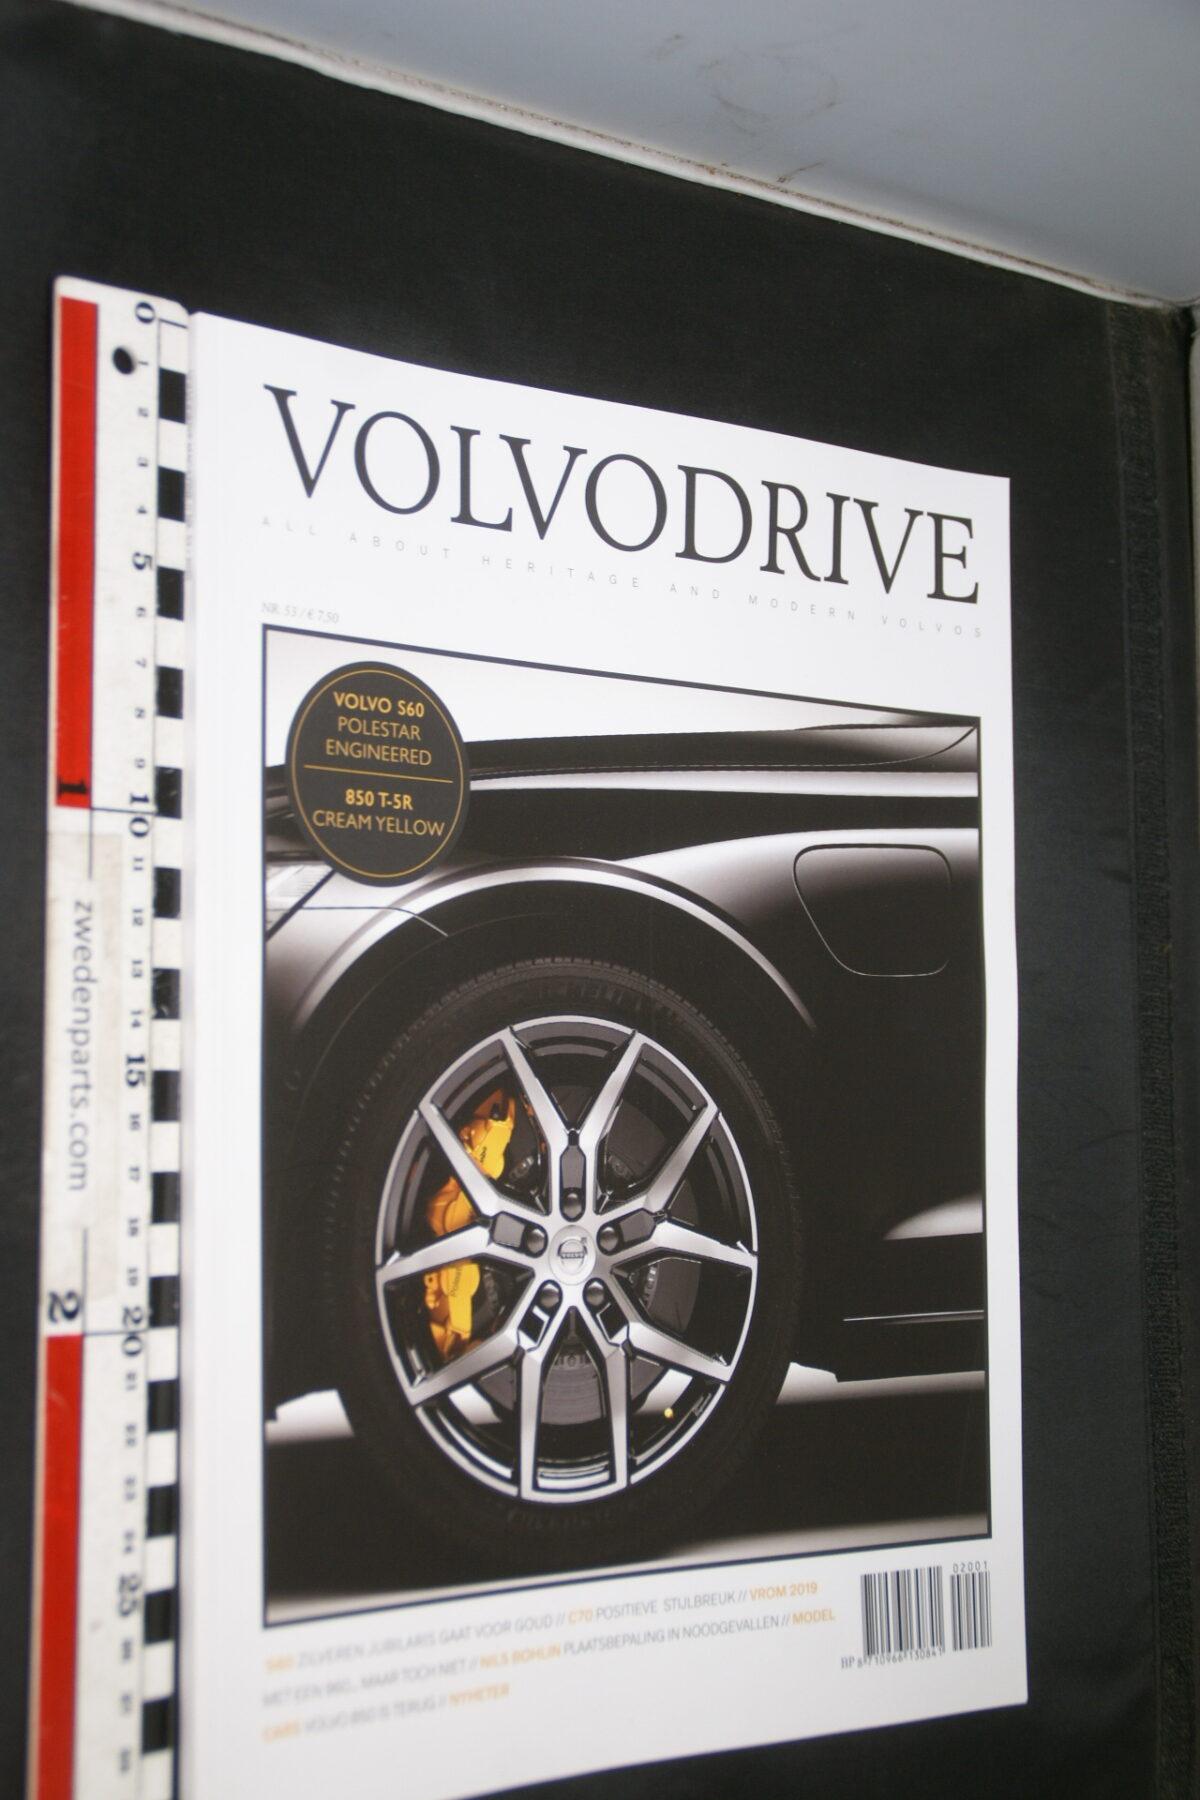 DSC08300 2020 tijdschrift Volvodrive magazine nr 53-c9c65f86